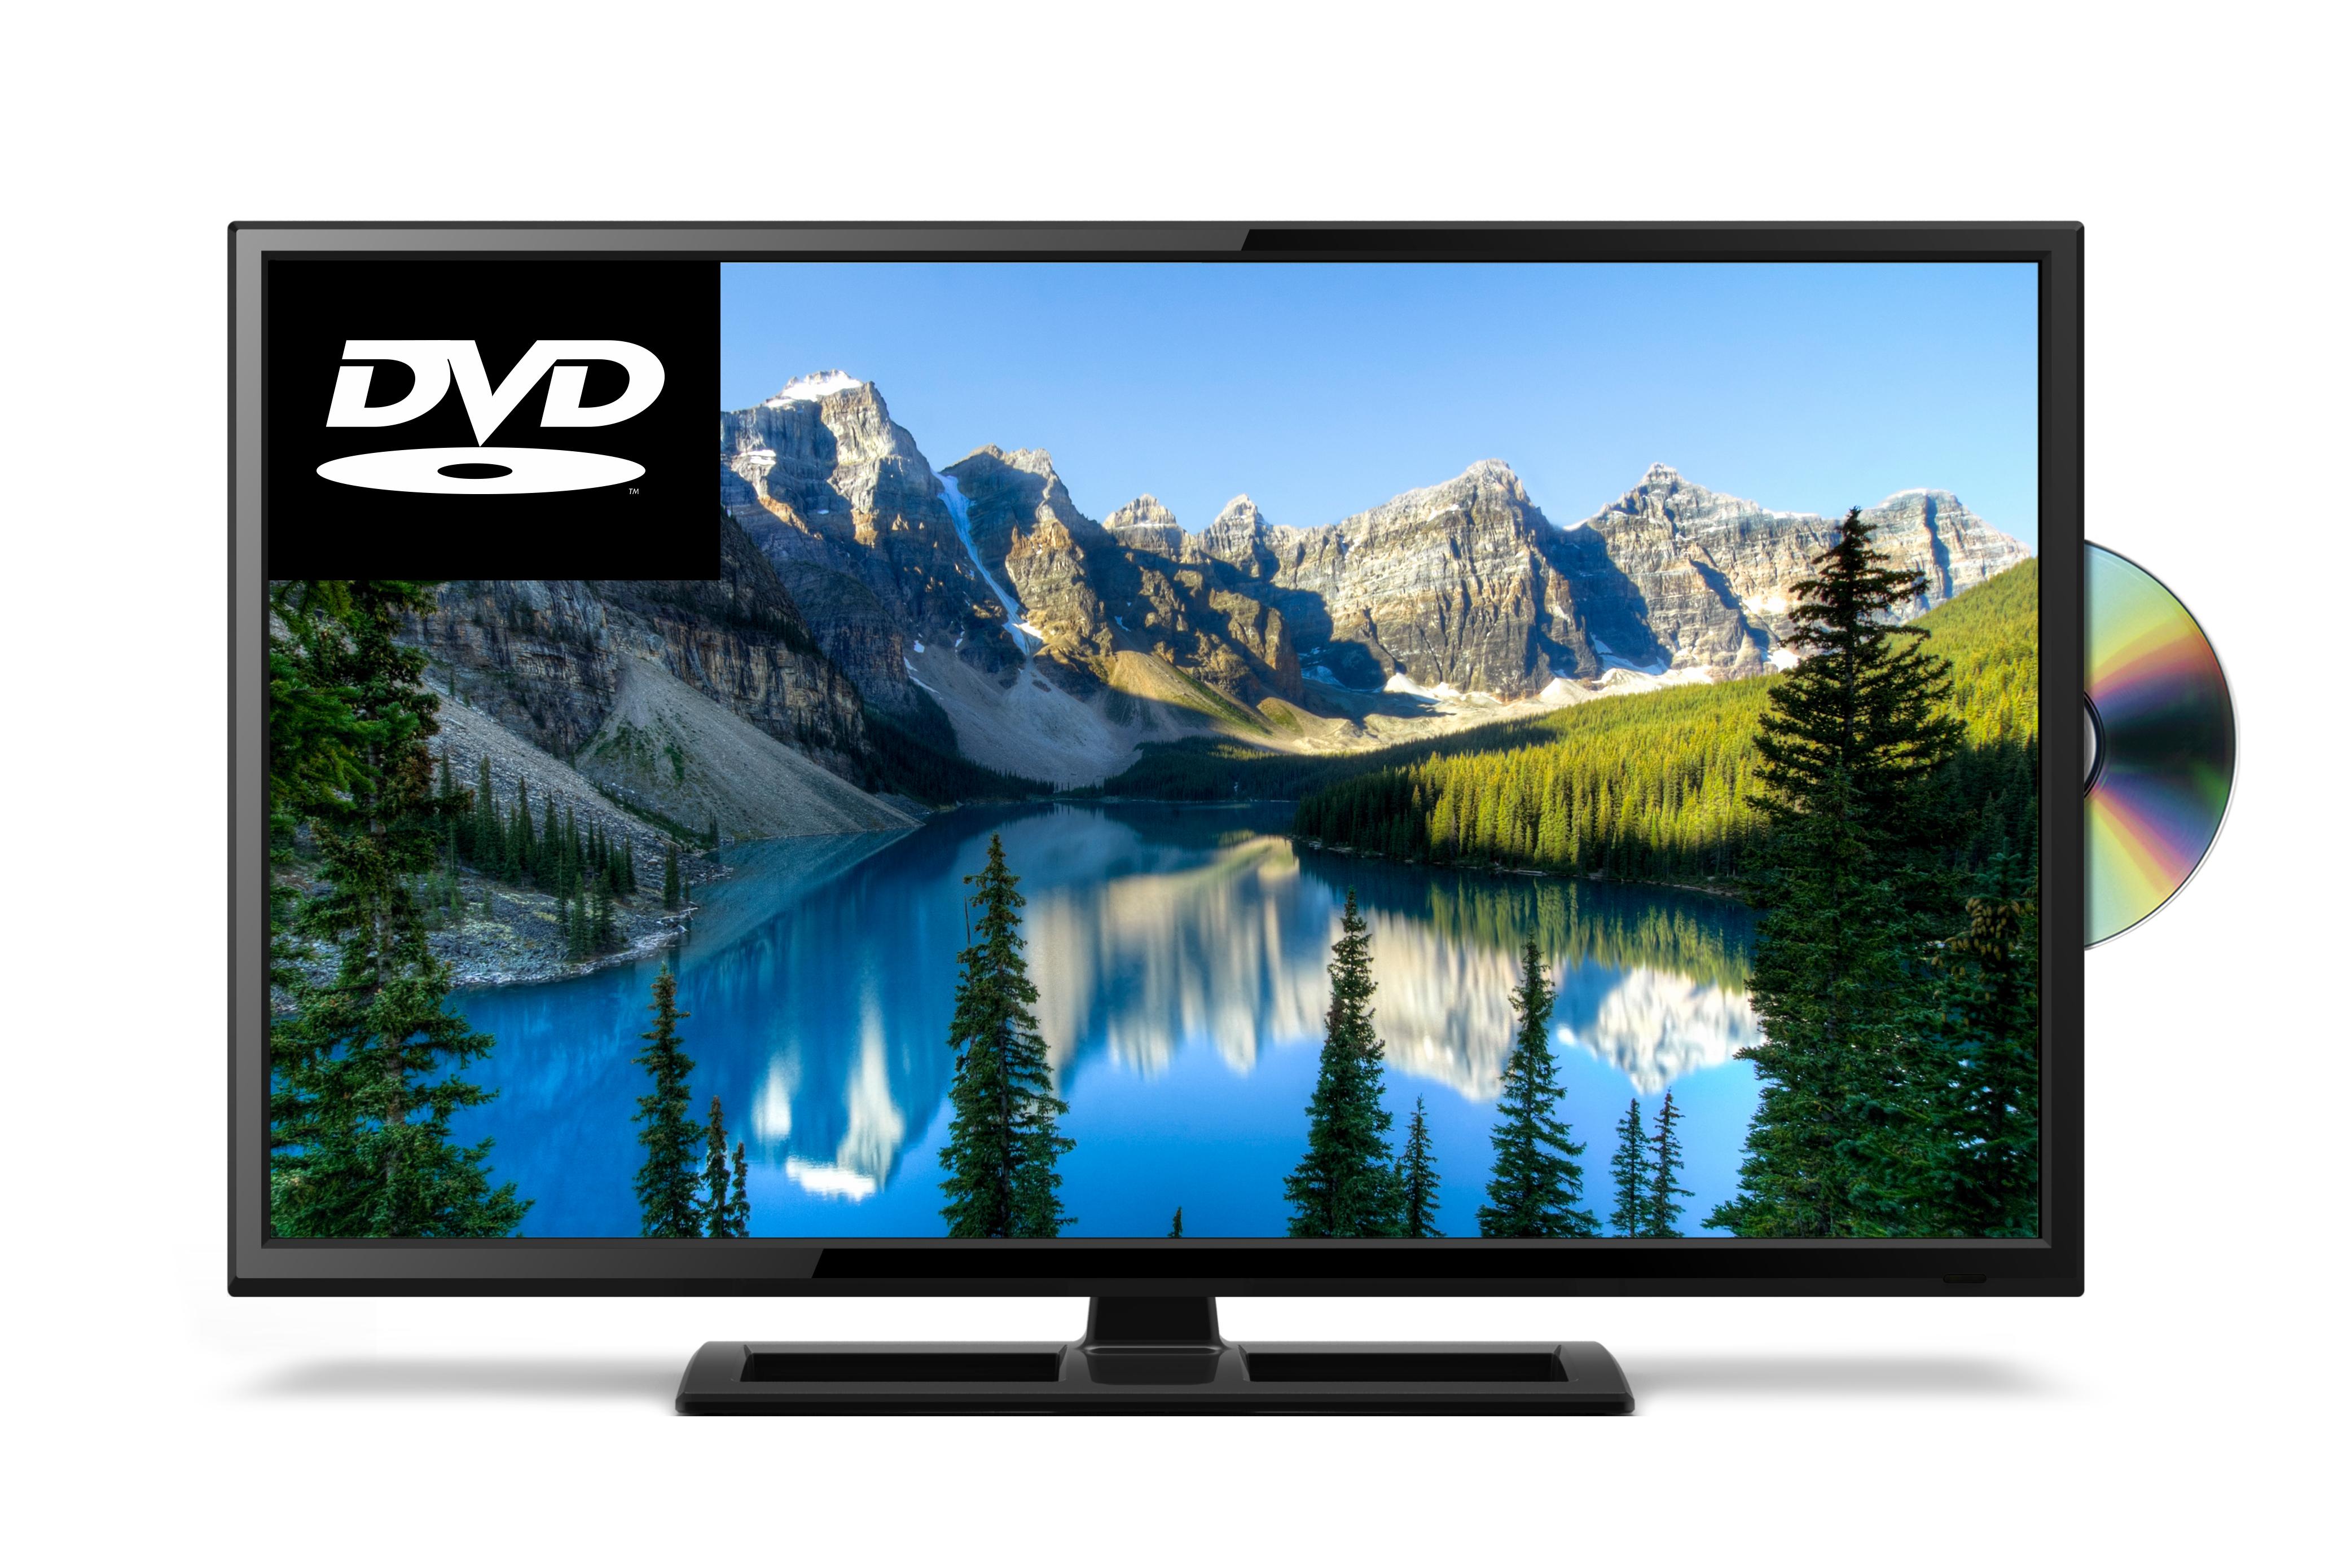 c28227f 28 led tv with dvd cello electronics uk ltd. Black Bedroom Furniture Sets. Home Design Ideas